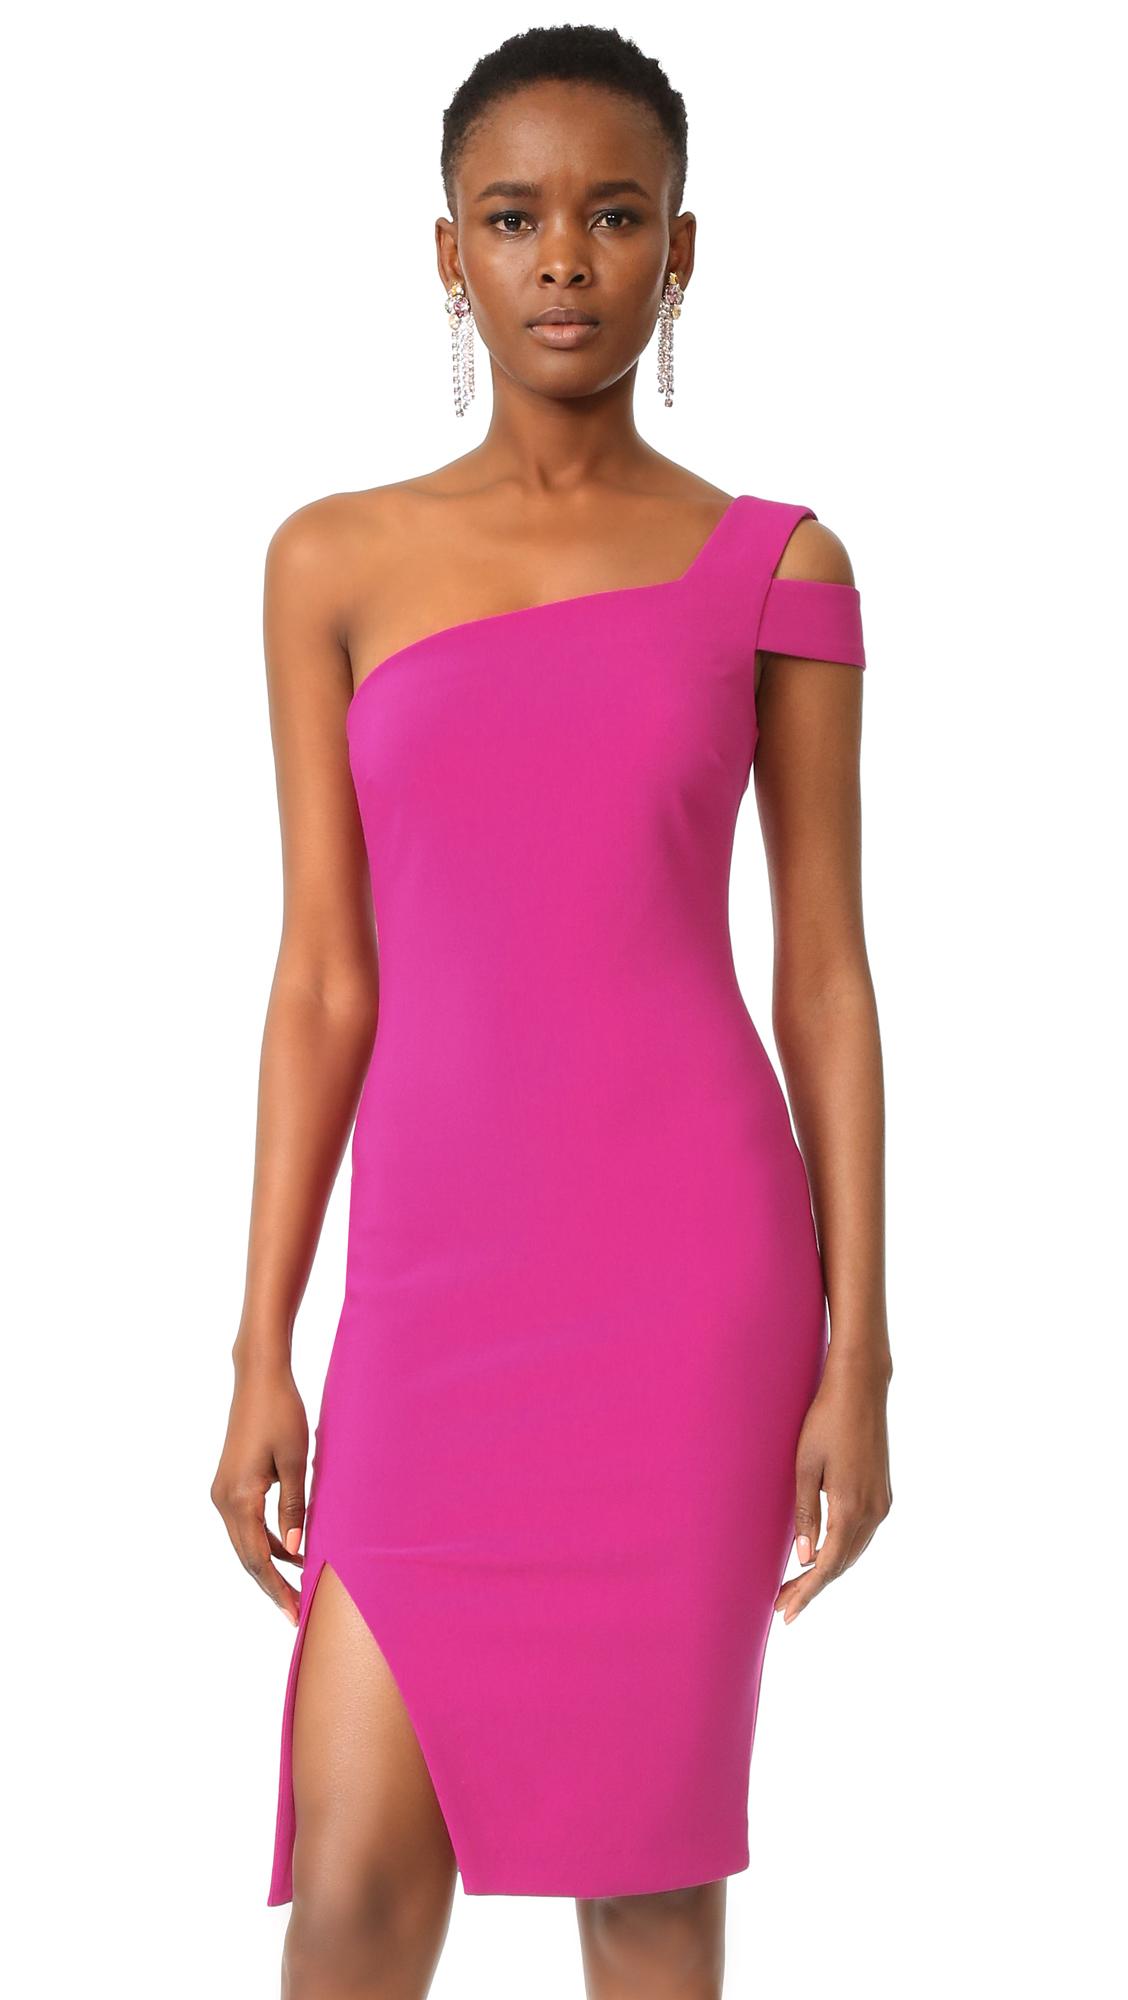 b1690100 LIKELY Packard Dress | SHOPBOP